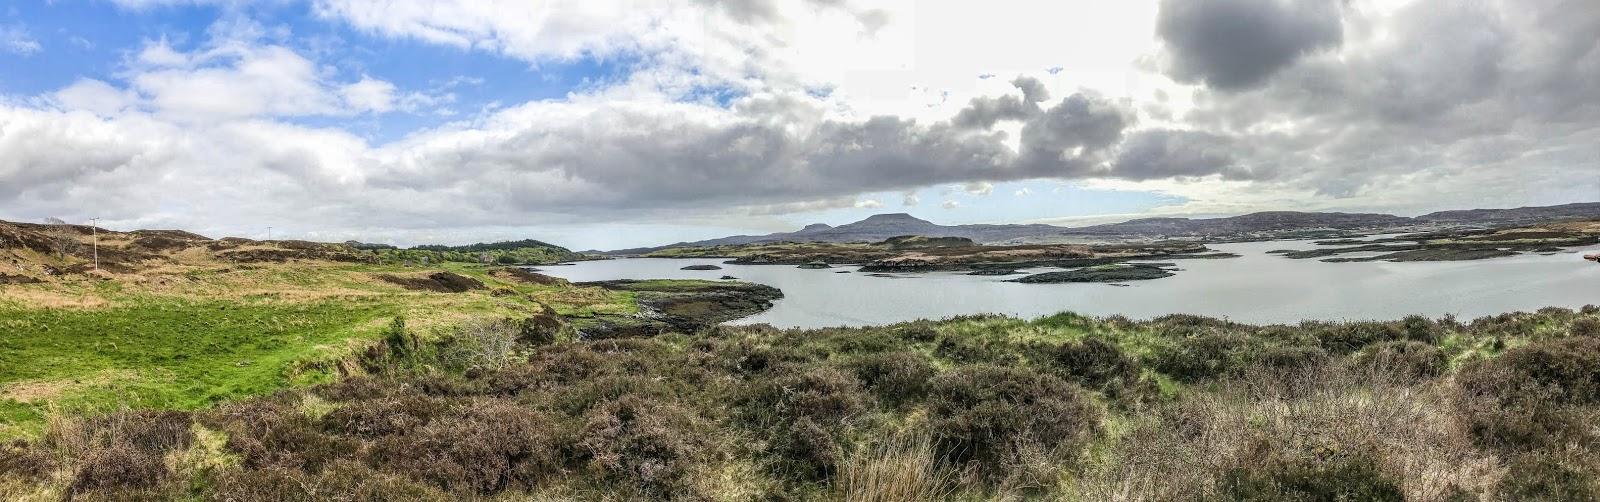 Isle of skye, scotland, loch, summer in scotland